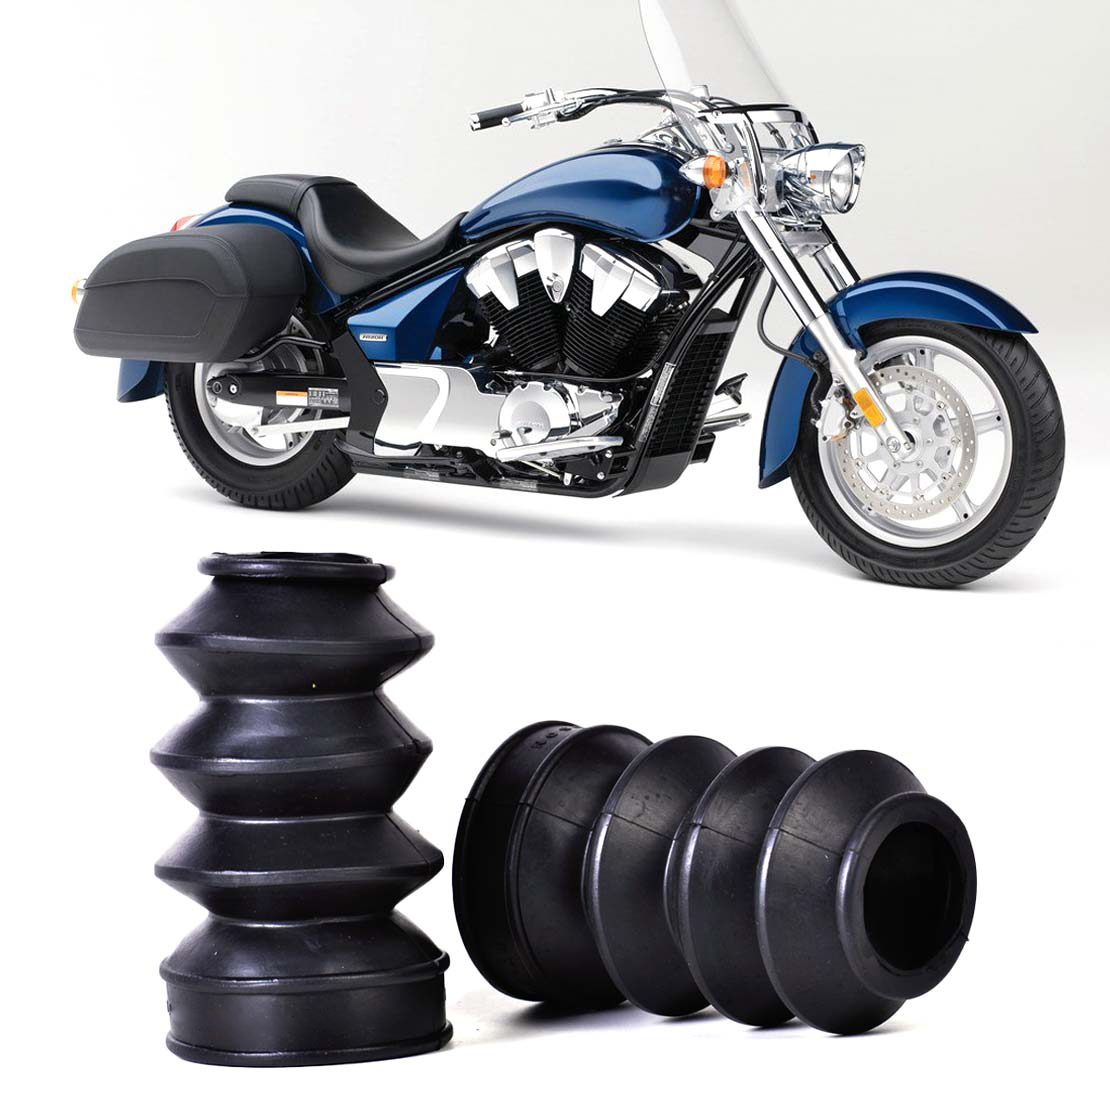 ⊹Dwcx 2 unids motocicleta goma Tenedores dirt cover Gaiter Gator ...